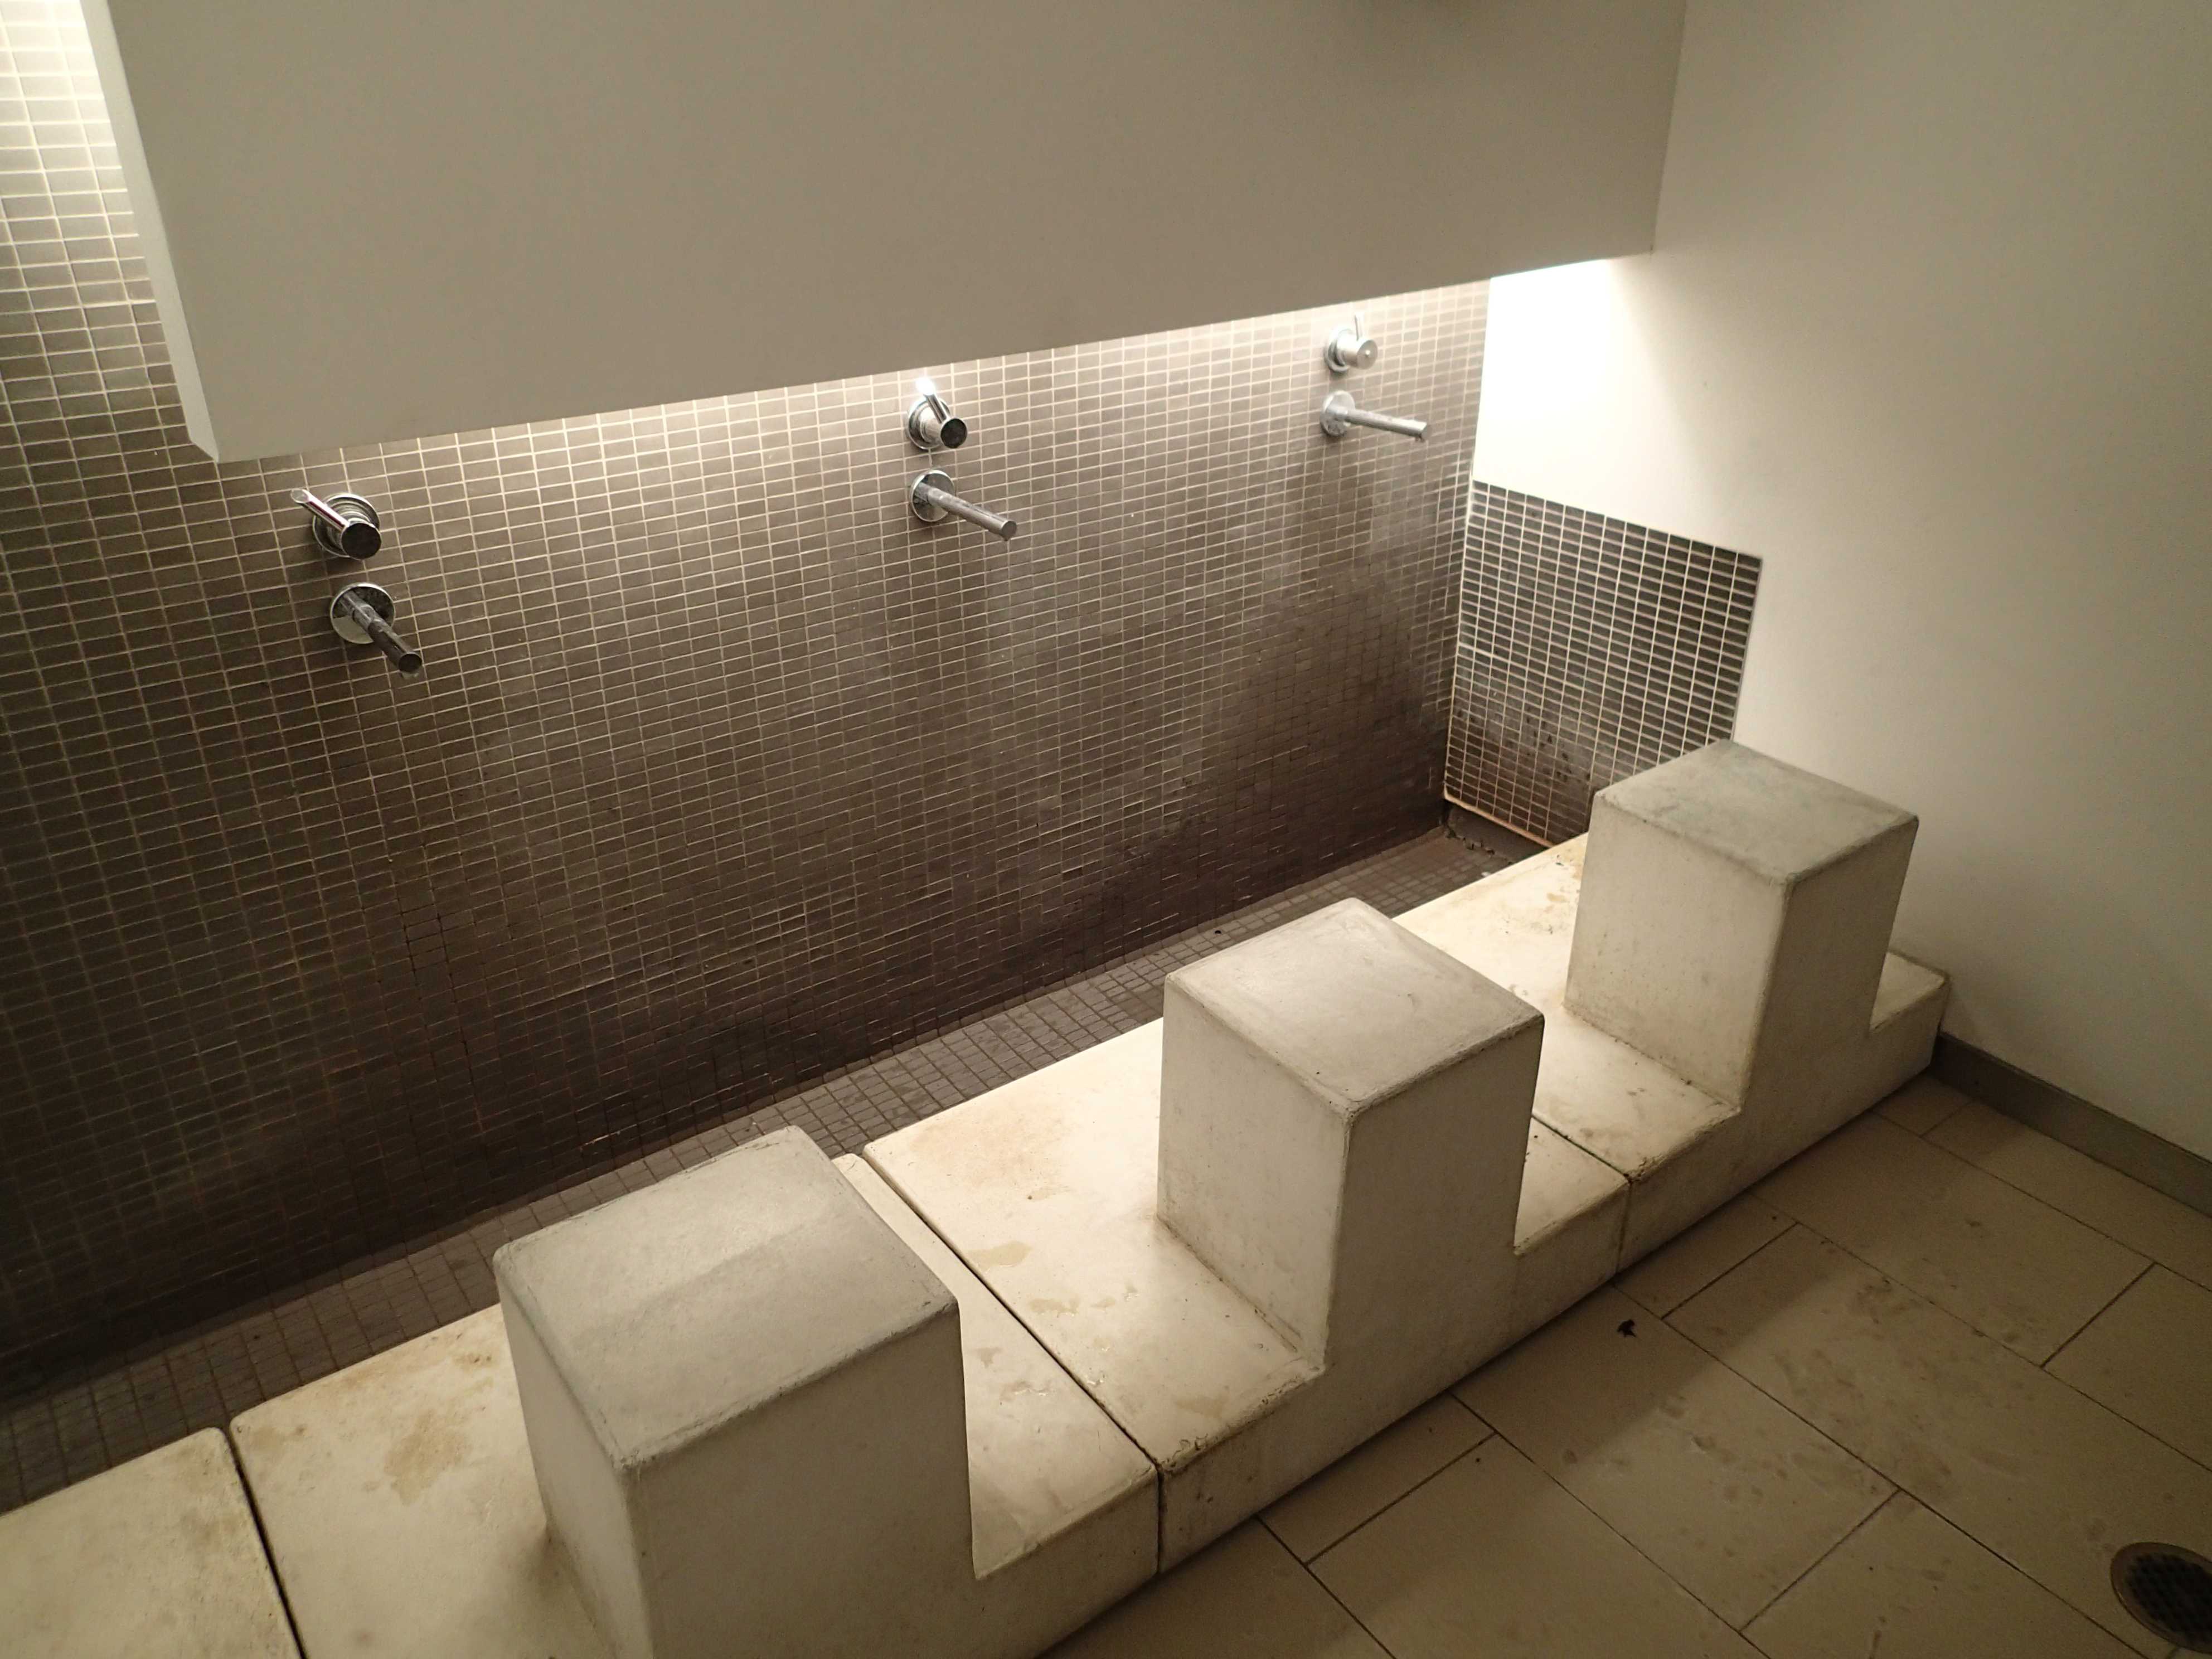 Room And Bathroom Forvrent Toronto